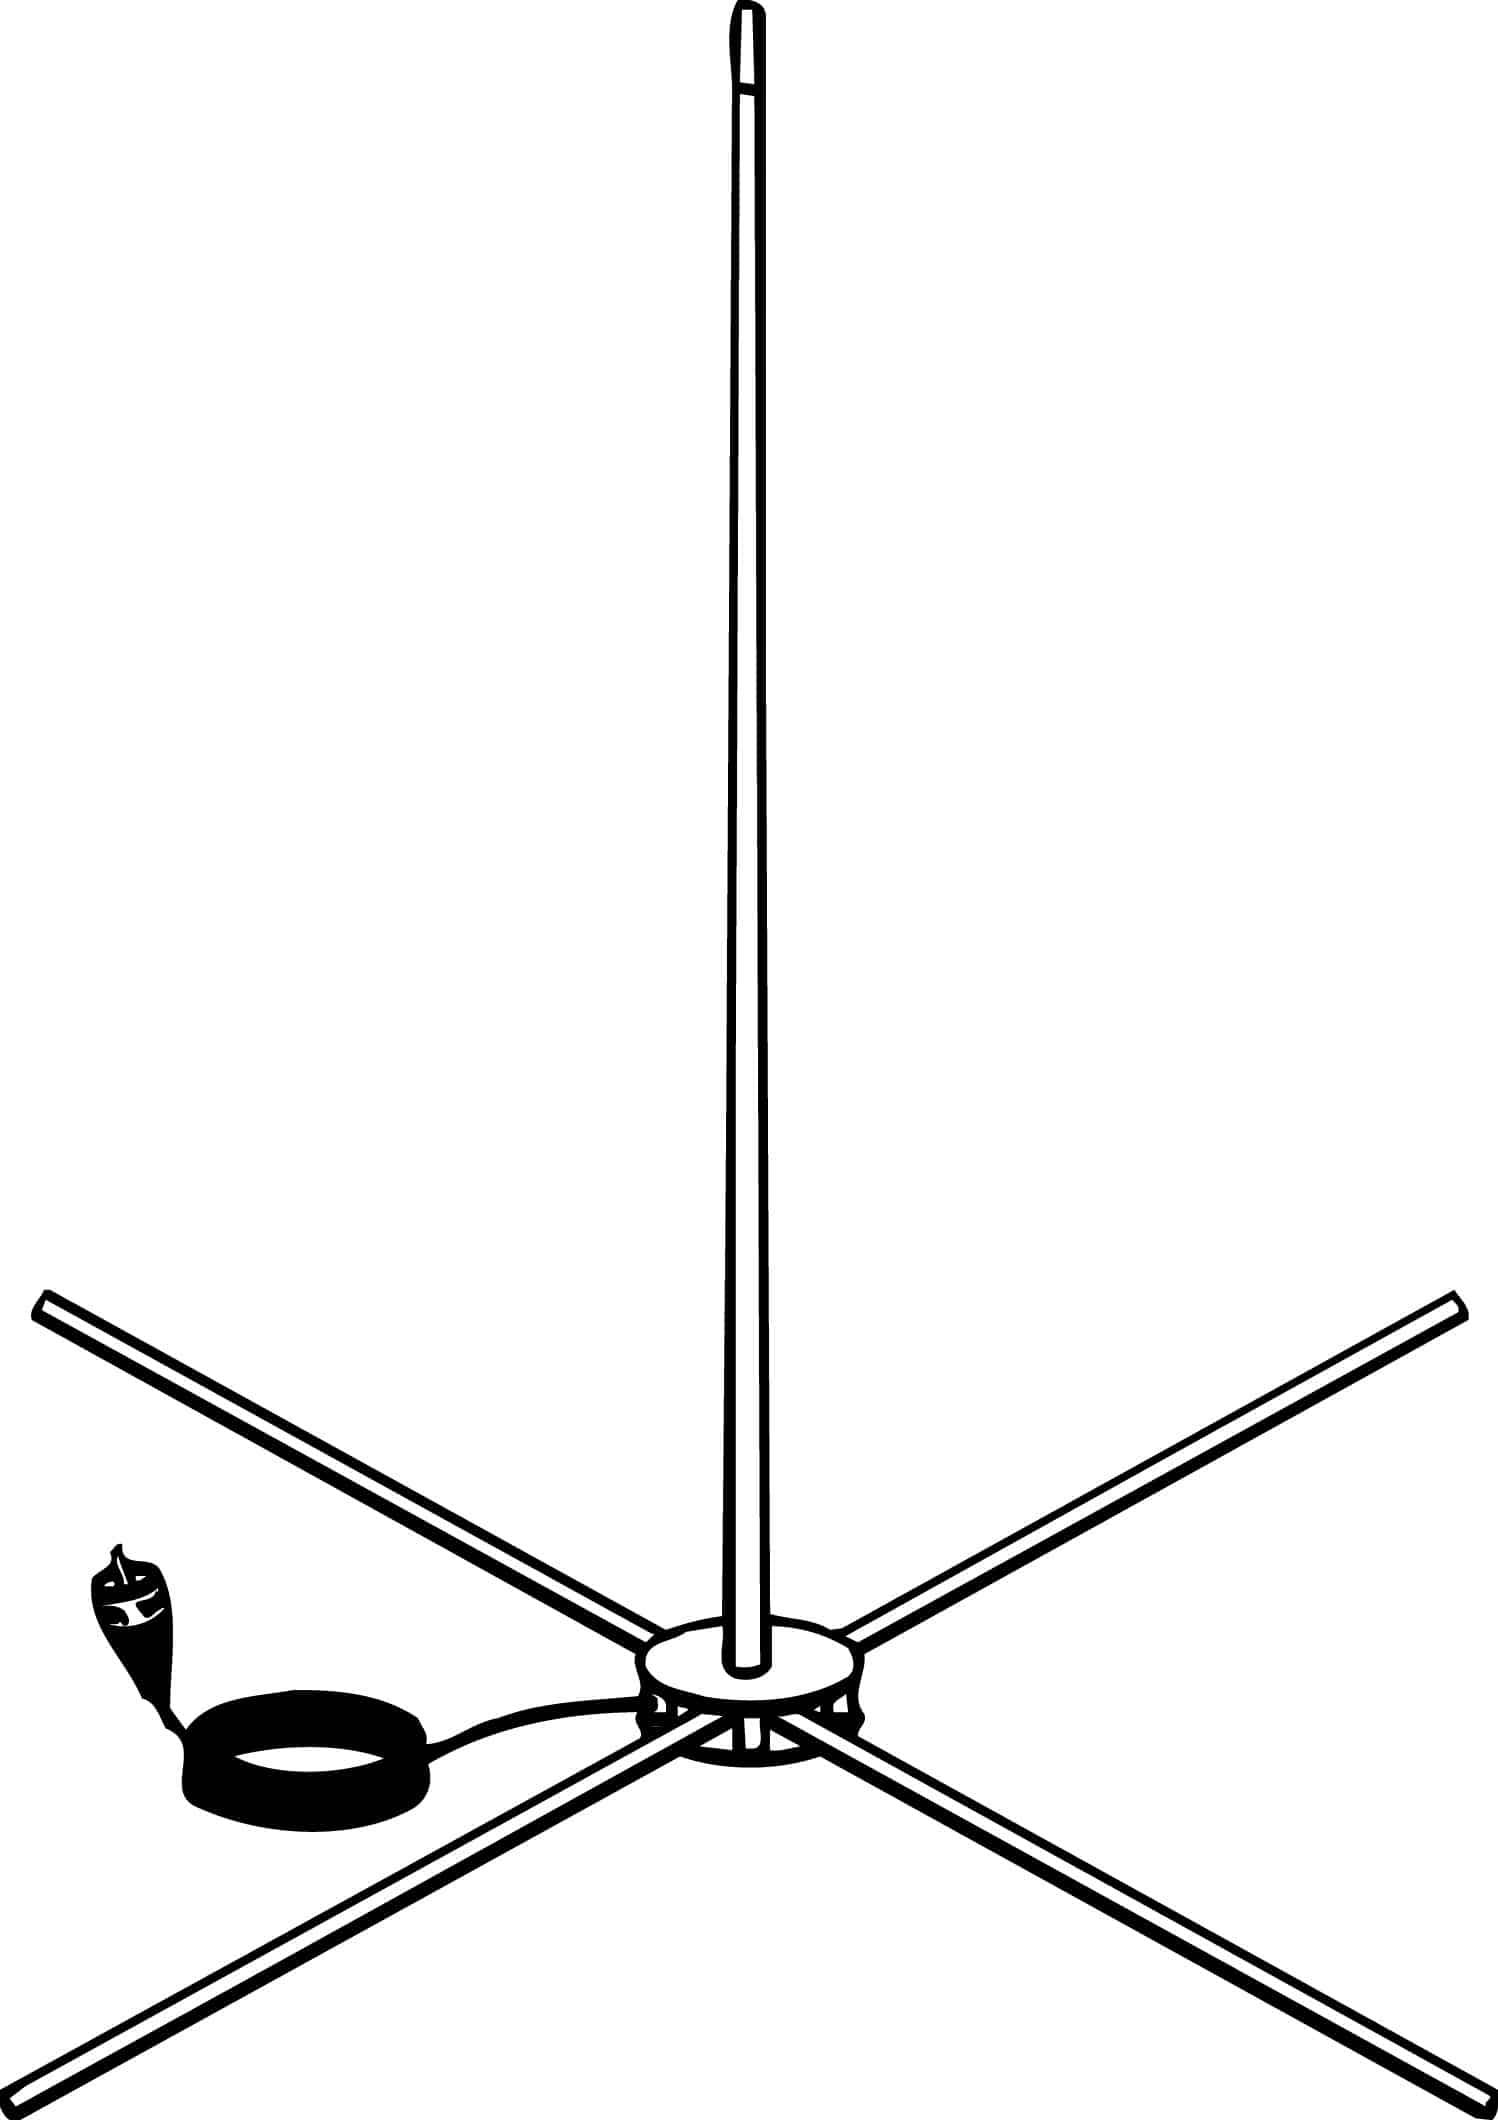 IBA5 - Firestik 60 Inch Indoor Cb Base Antenna